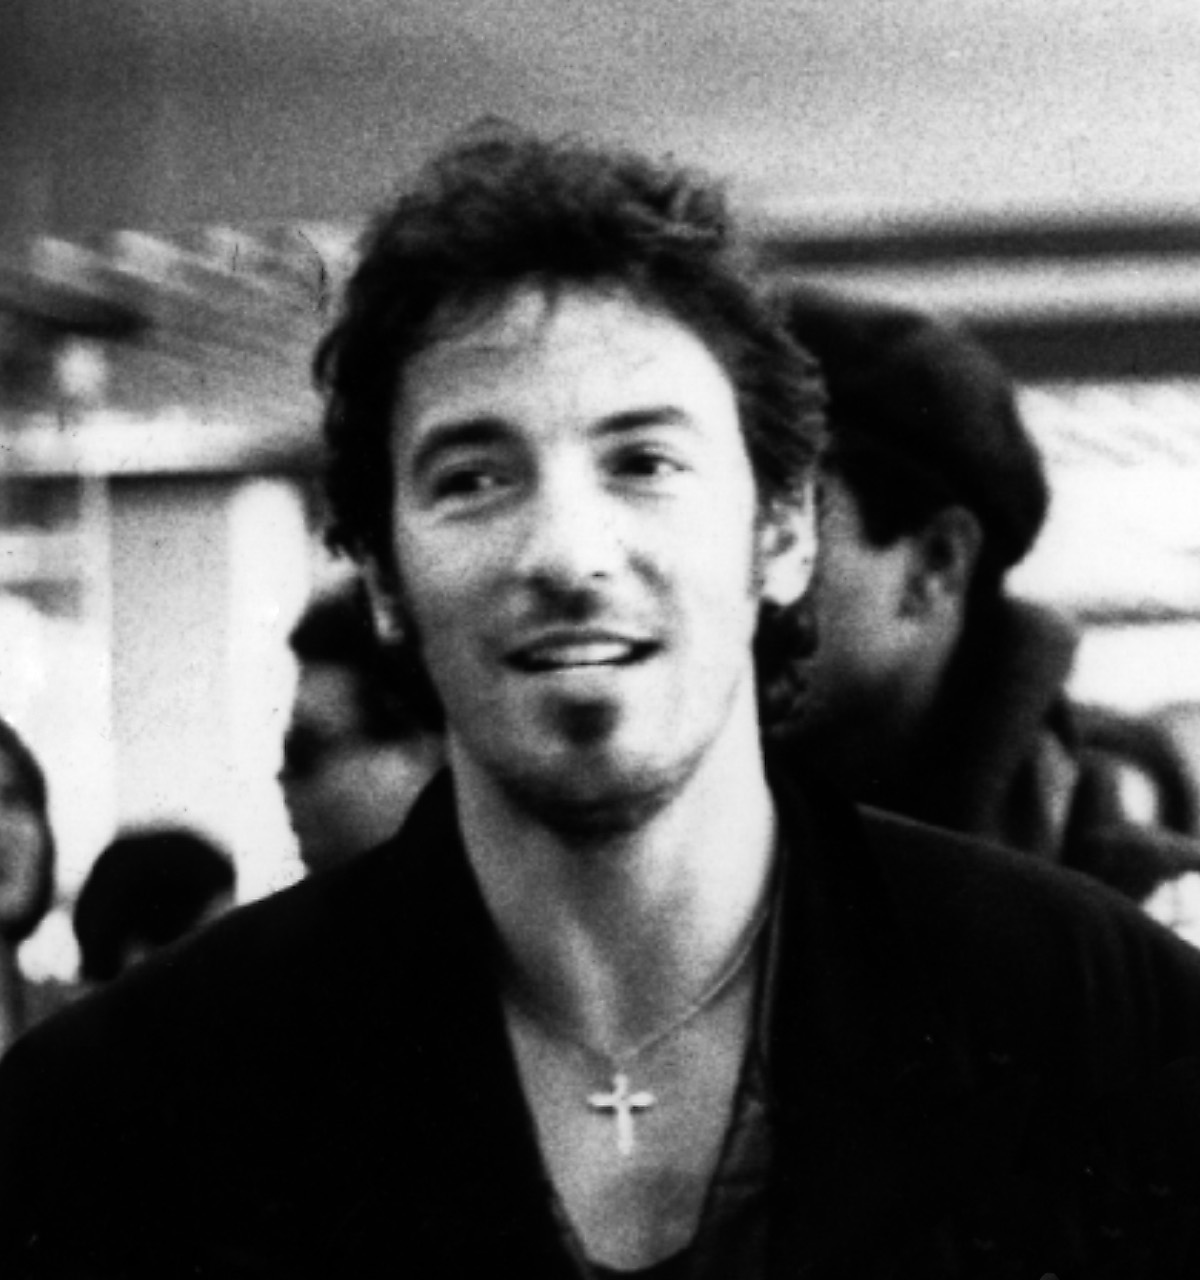 Bruce_Springsteen_1988